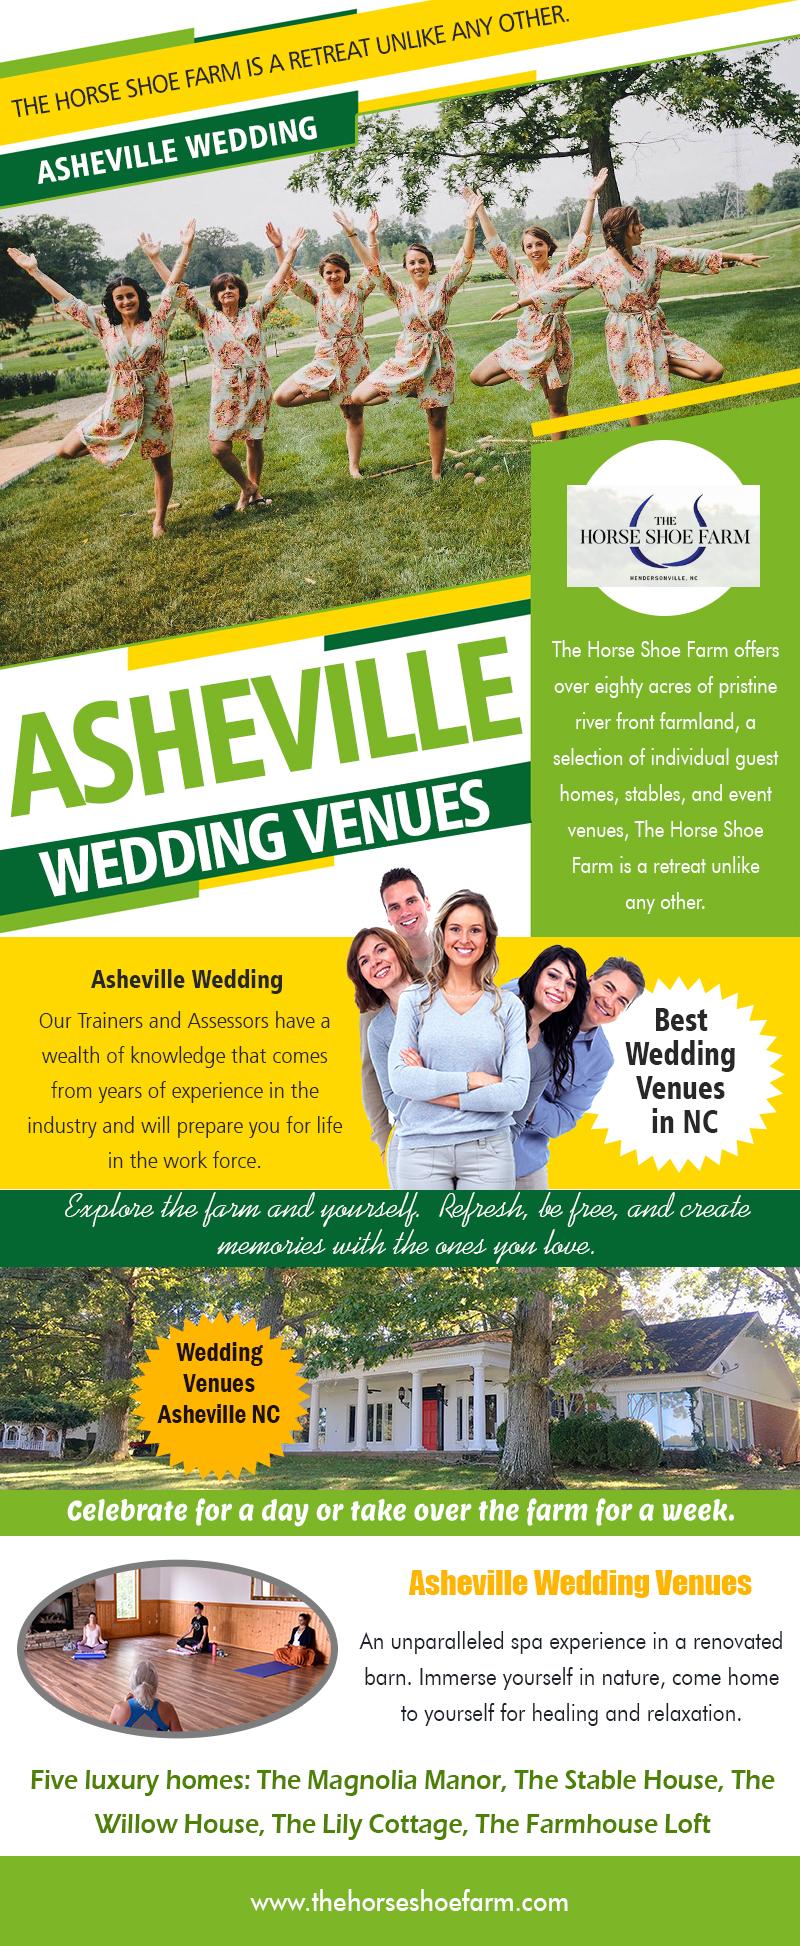 Best Wedding Venues In NC | Call – 828-393-3034 | thehorseshoefarm.com